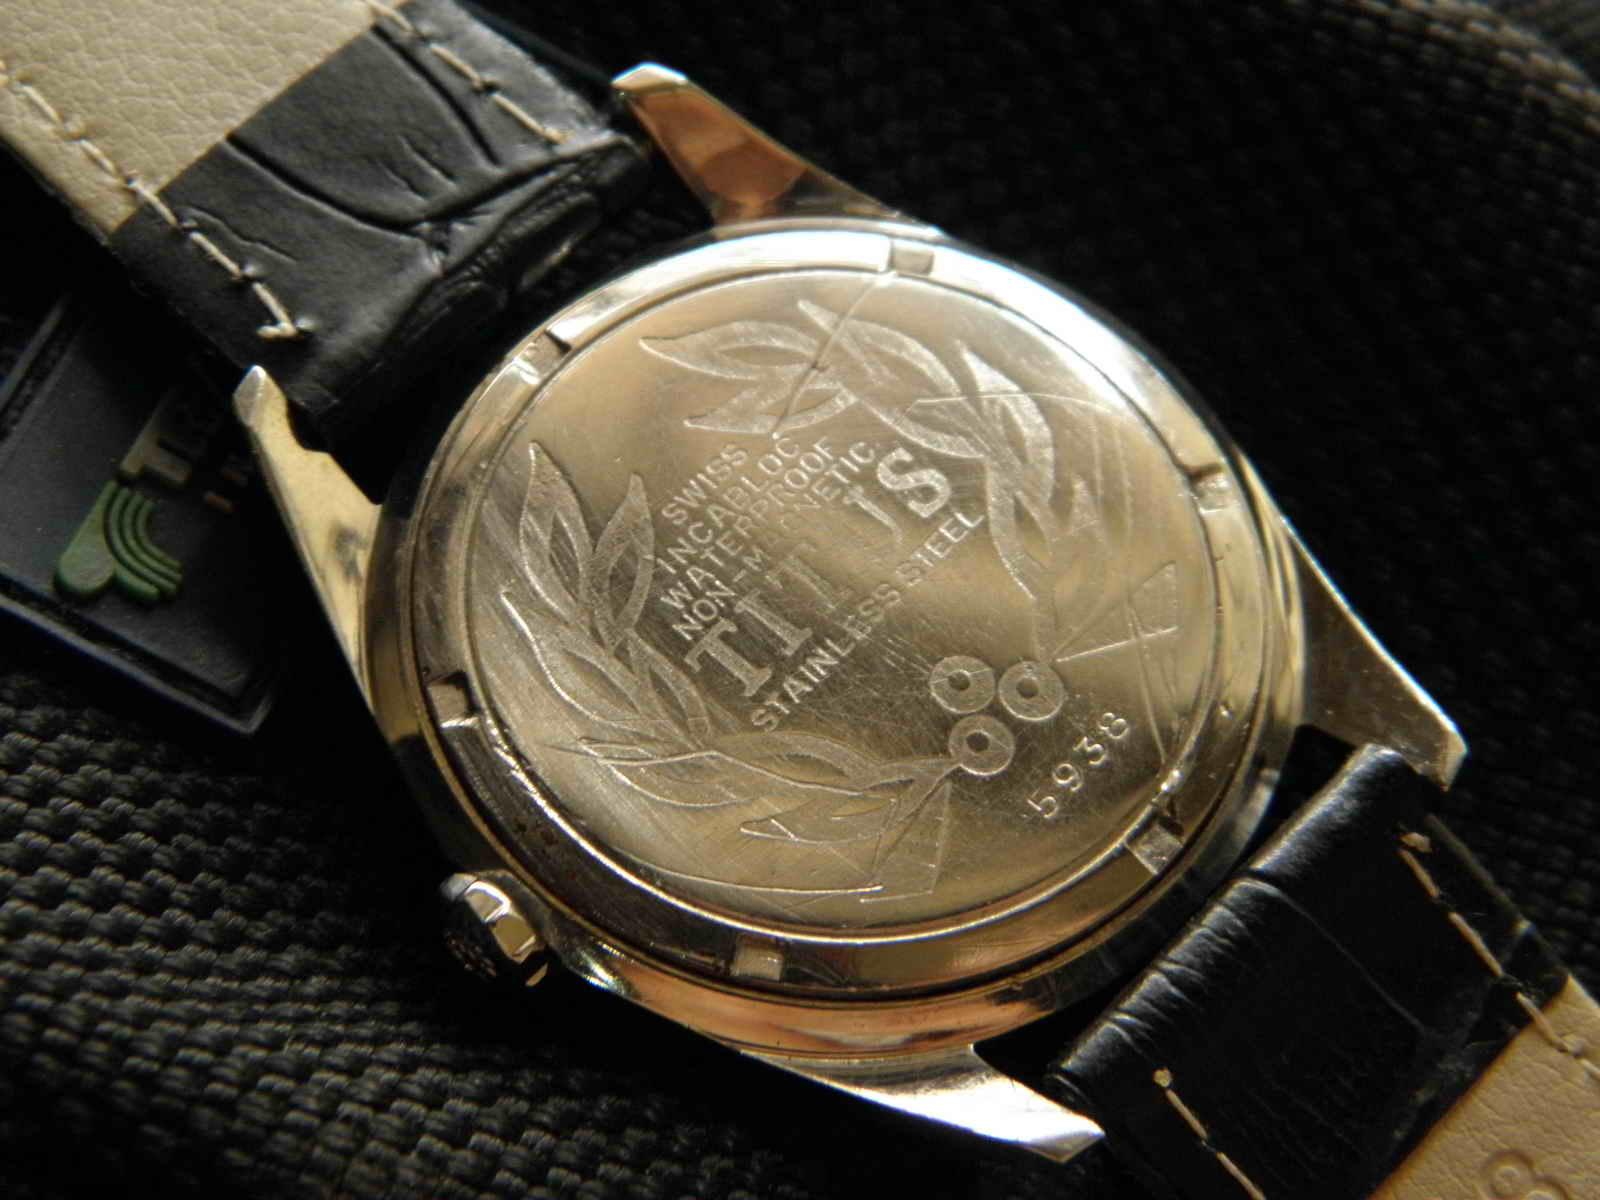 Kiosku Oktober 2015 Rolex Gmt Kombinasi Swiss Mesin 2838 2 Movement Manual Wind Made 21 Jewels Dia 36 Mm W C Crosshair Dial Black Masih Sangat Baik Index Mata Panah Berikut Hands Pedang